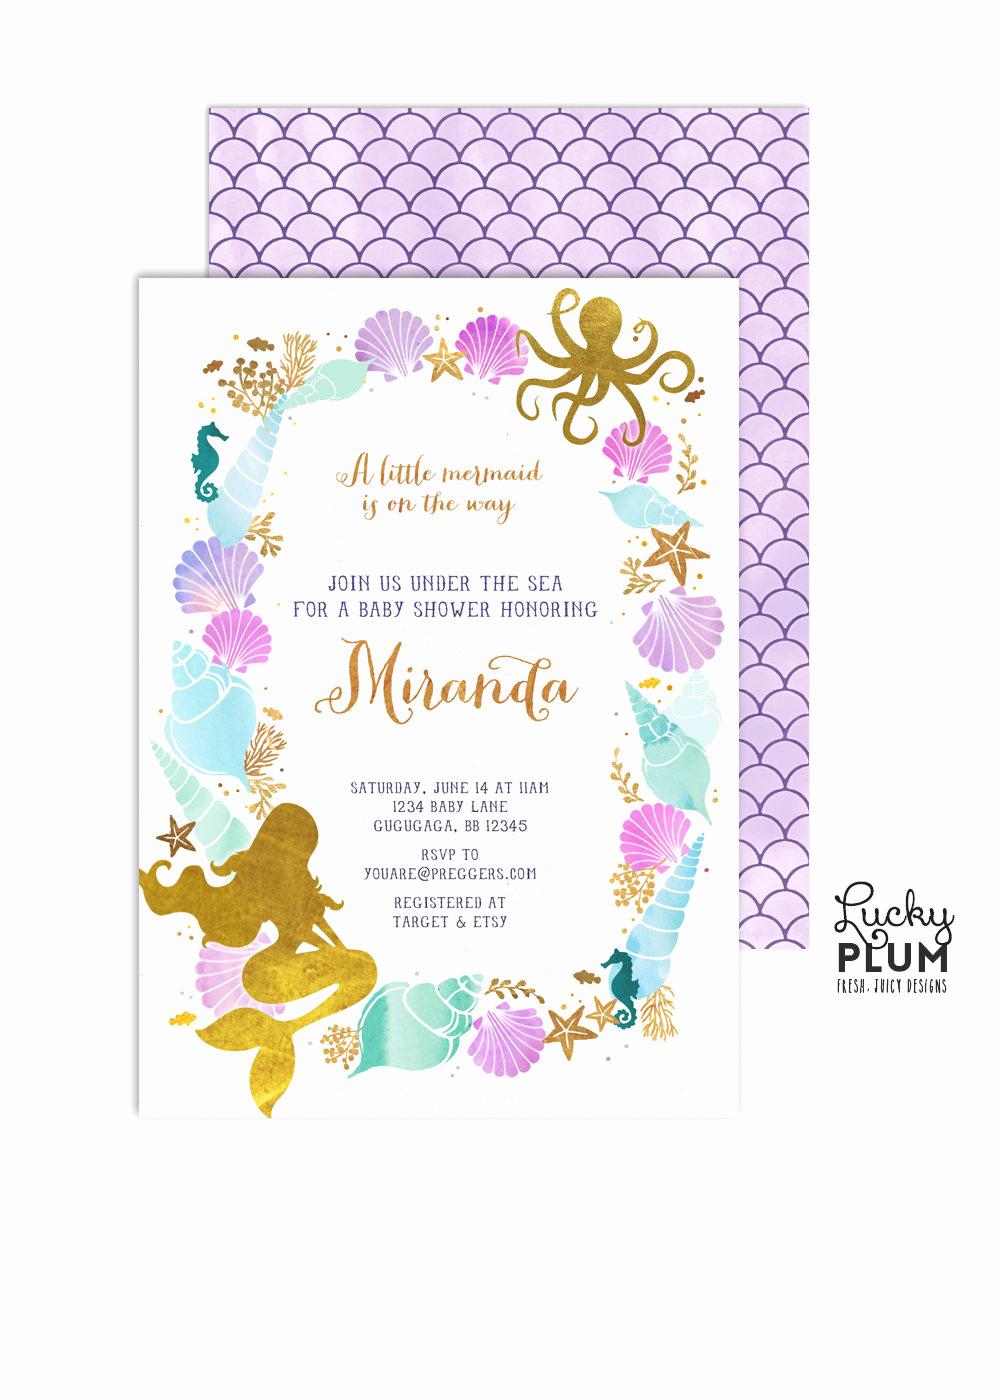 Mermaid Baby Shower Invitation Wording Beautiful Mermaid Baby Shower Invitation Ocean Baby Shower Invitation